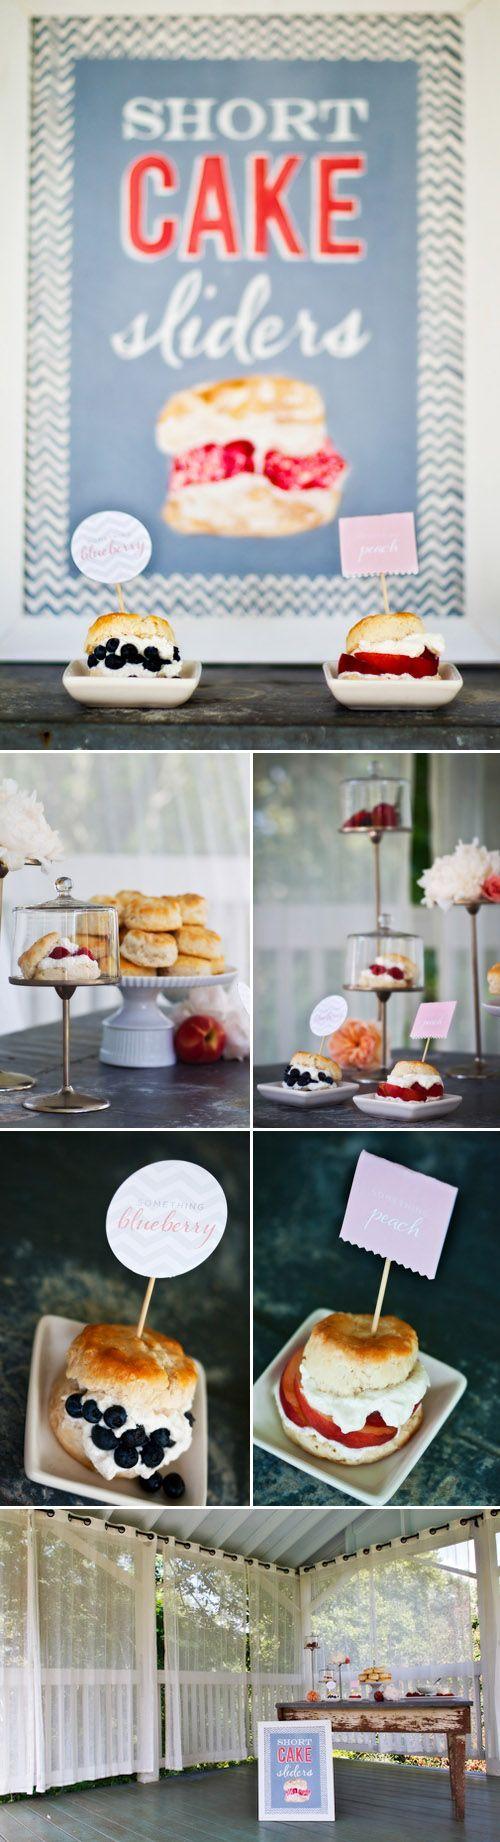 Short Cake Sliders | Recipes to Try-Desserts | Pinterest